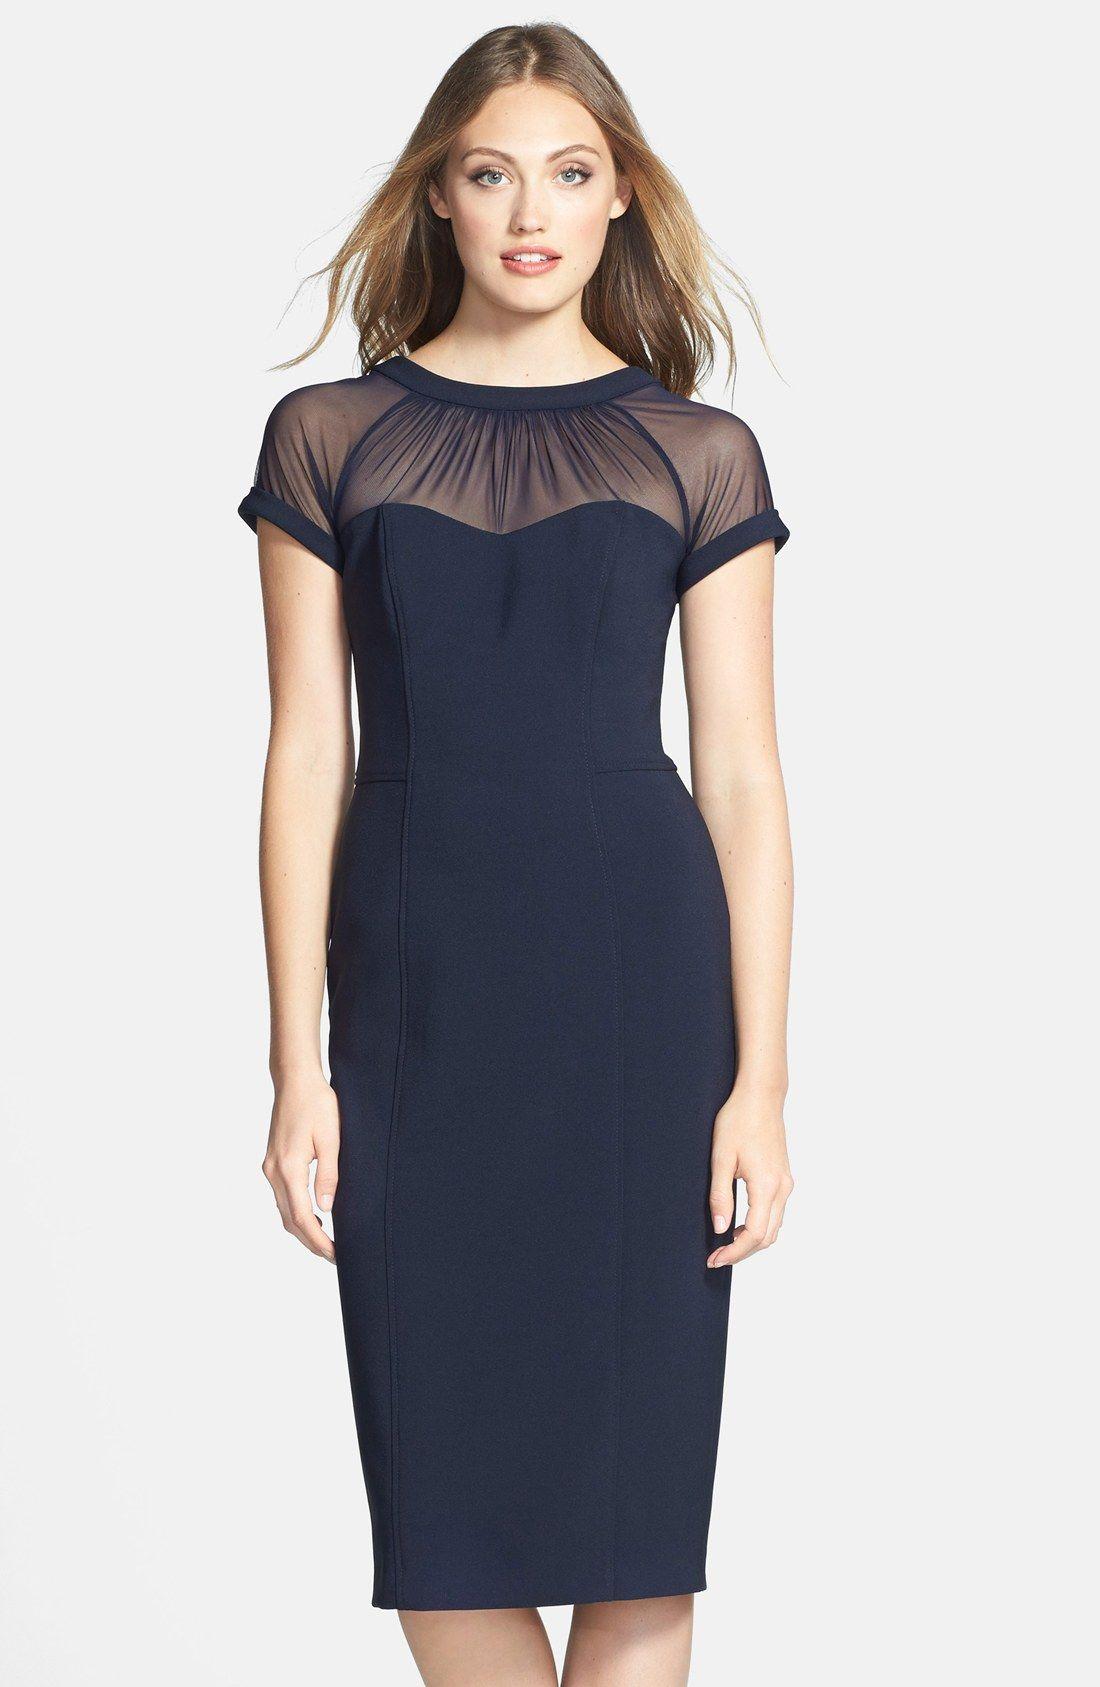 4dde3663 Maggy London Illusion Yoke Crepe Sheath Dress | Pretty Little Liars ...